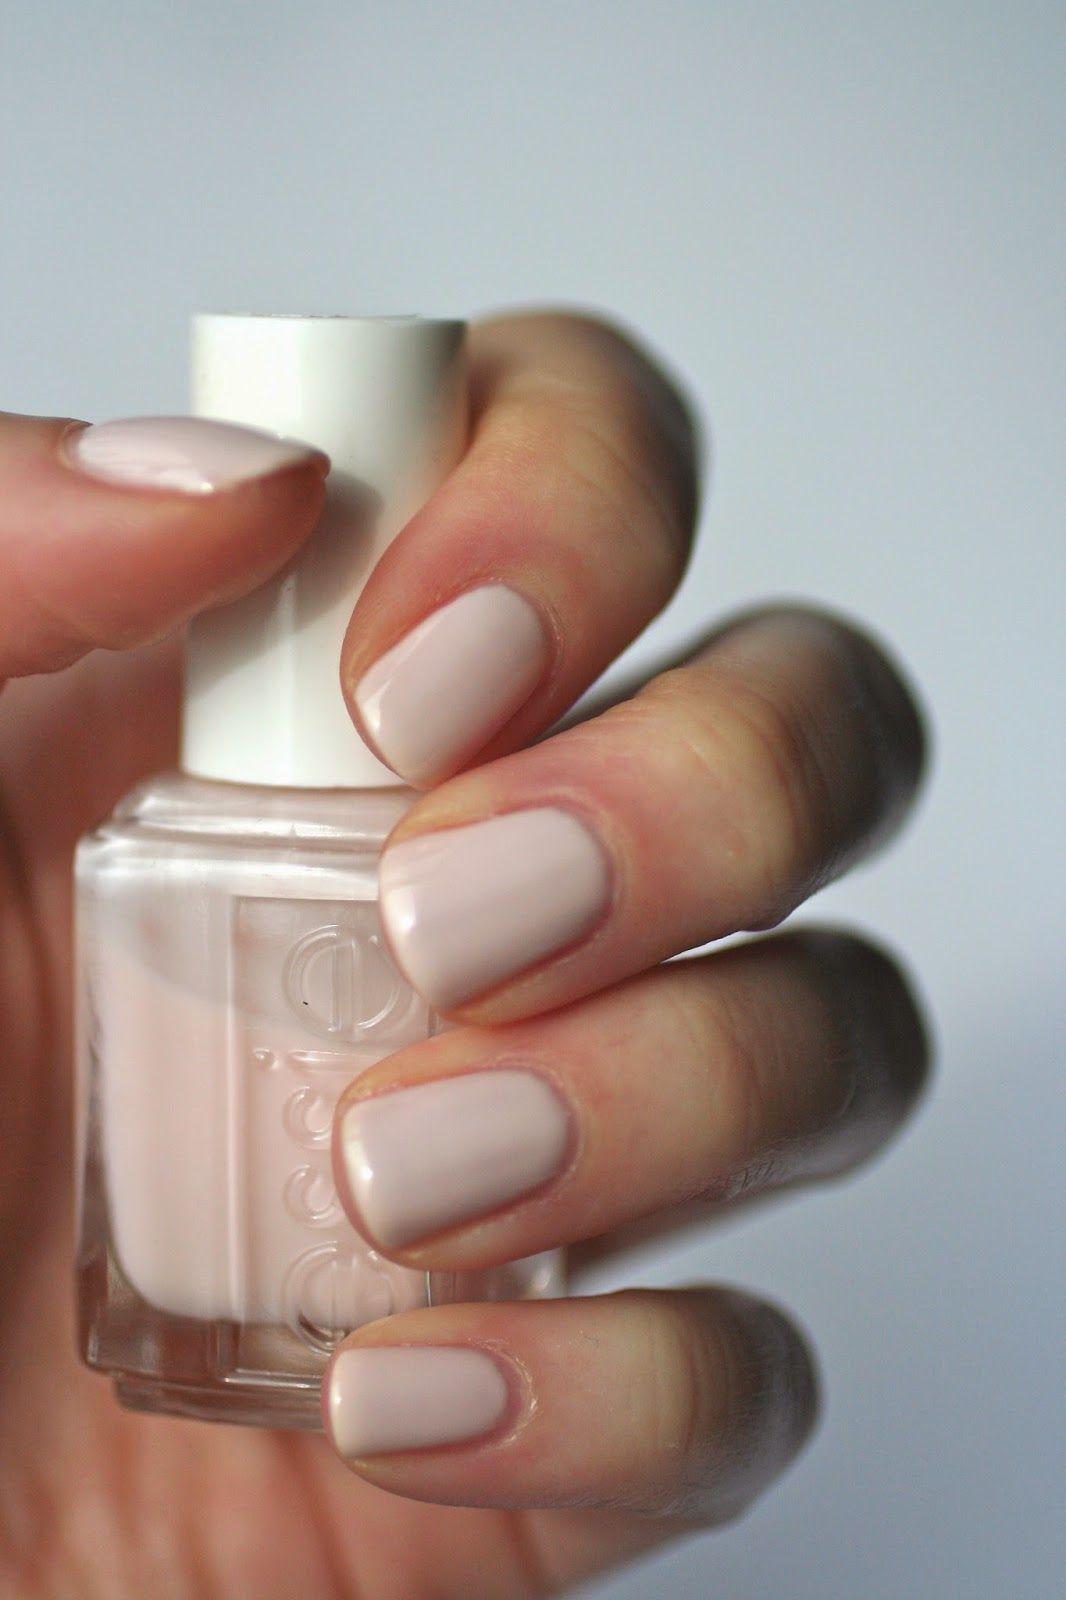 Essie Pale Pink Comparison Ballet Slippers Minimalistic Romper Room Fiji Pale Pink Nails Essie Nail Pink Nails